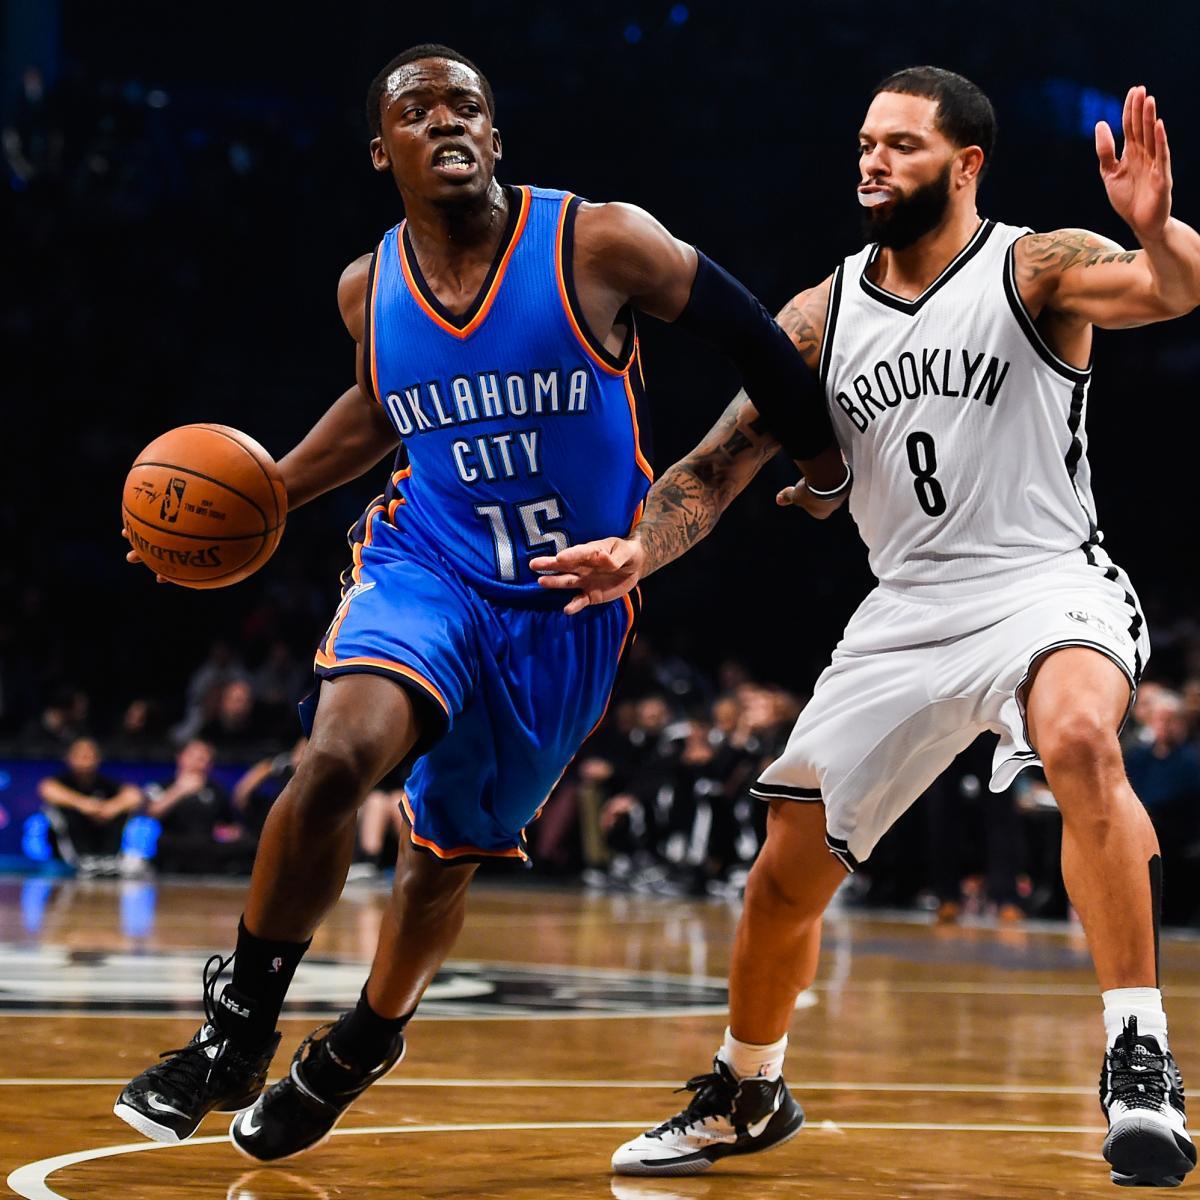 Warriors Vs Nets Full Game Highlights: Brooklyn Nets Vs. Oklahoma City Thunder: Live Score